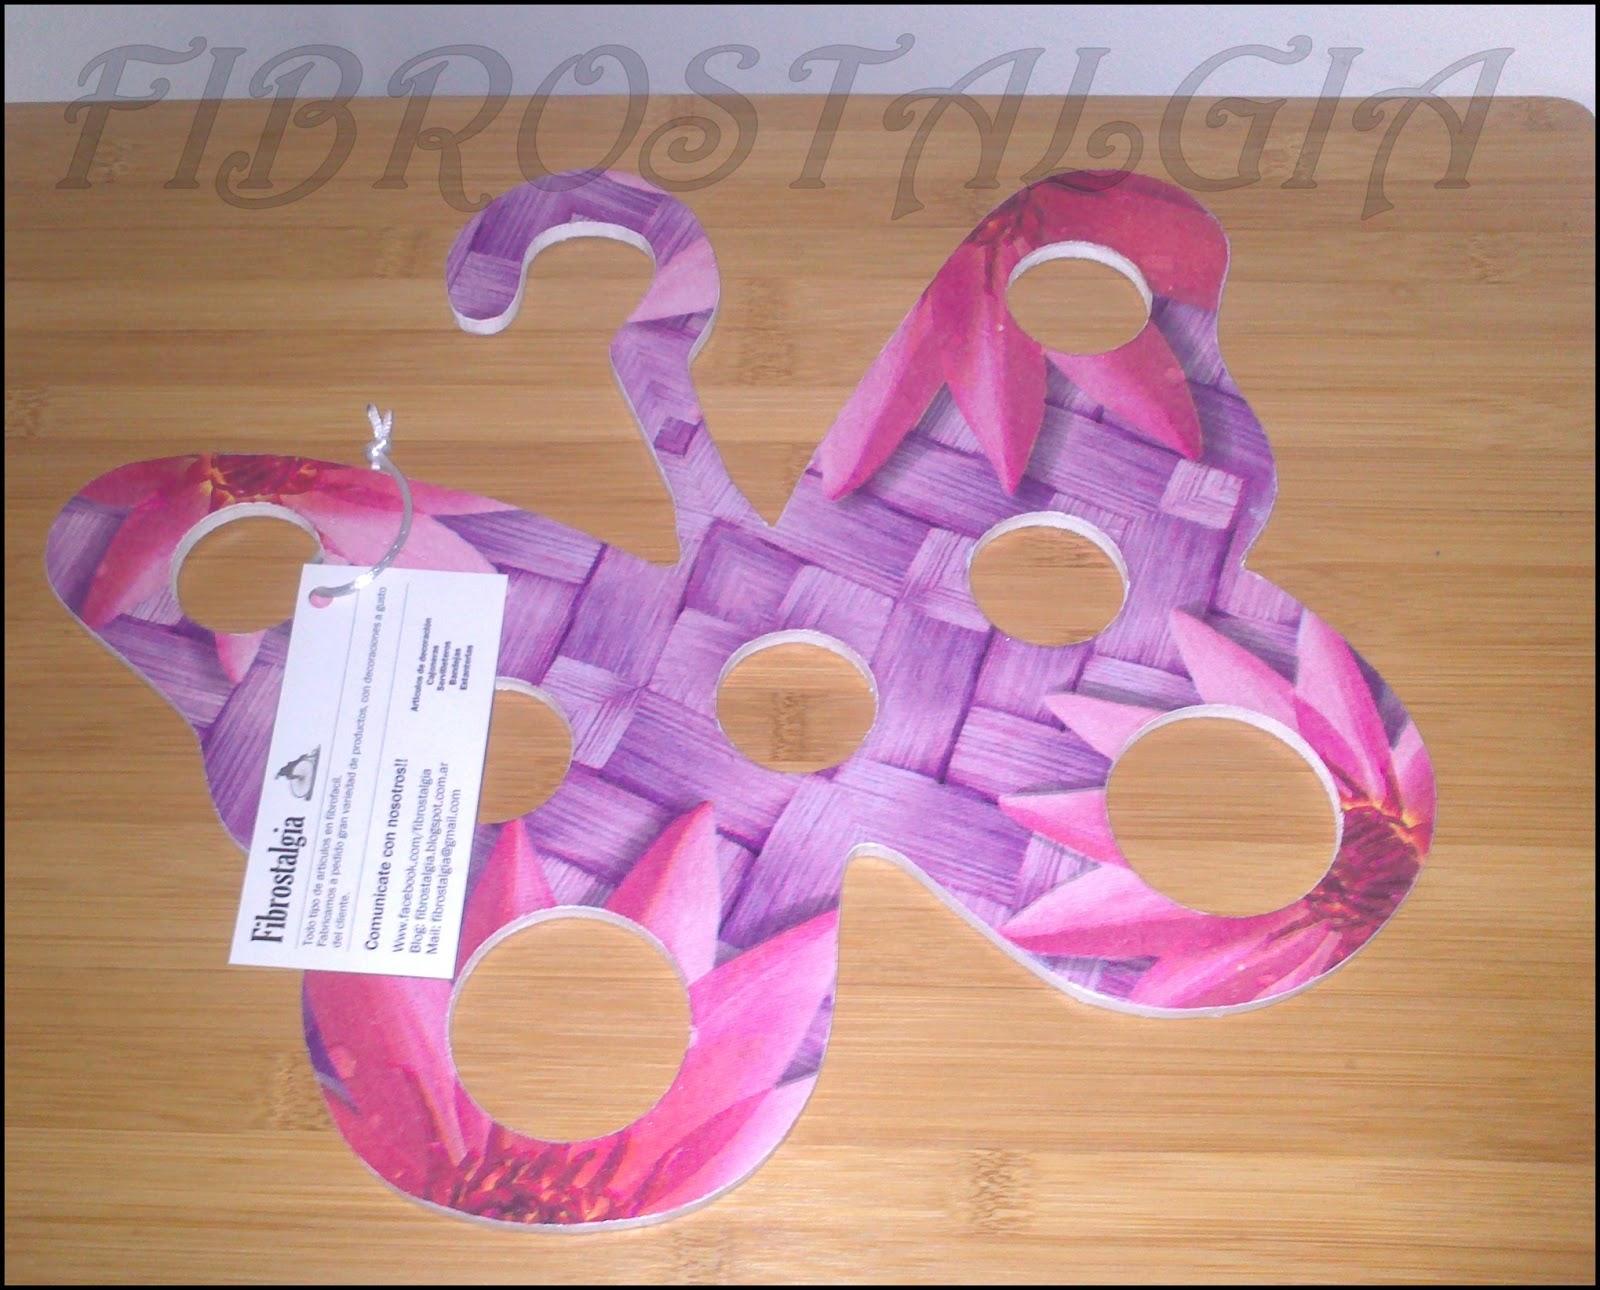 Articulos en fibrofacil porta aros percha mariposa - Percha para panuelos ...